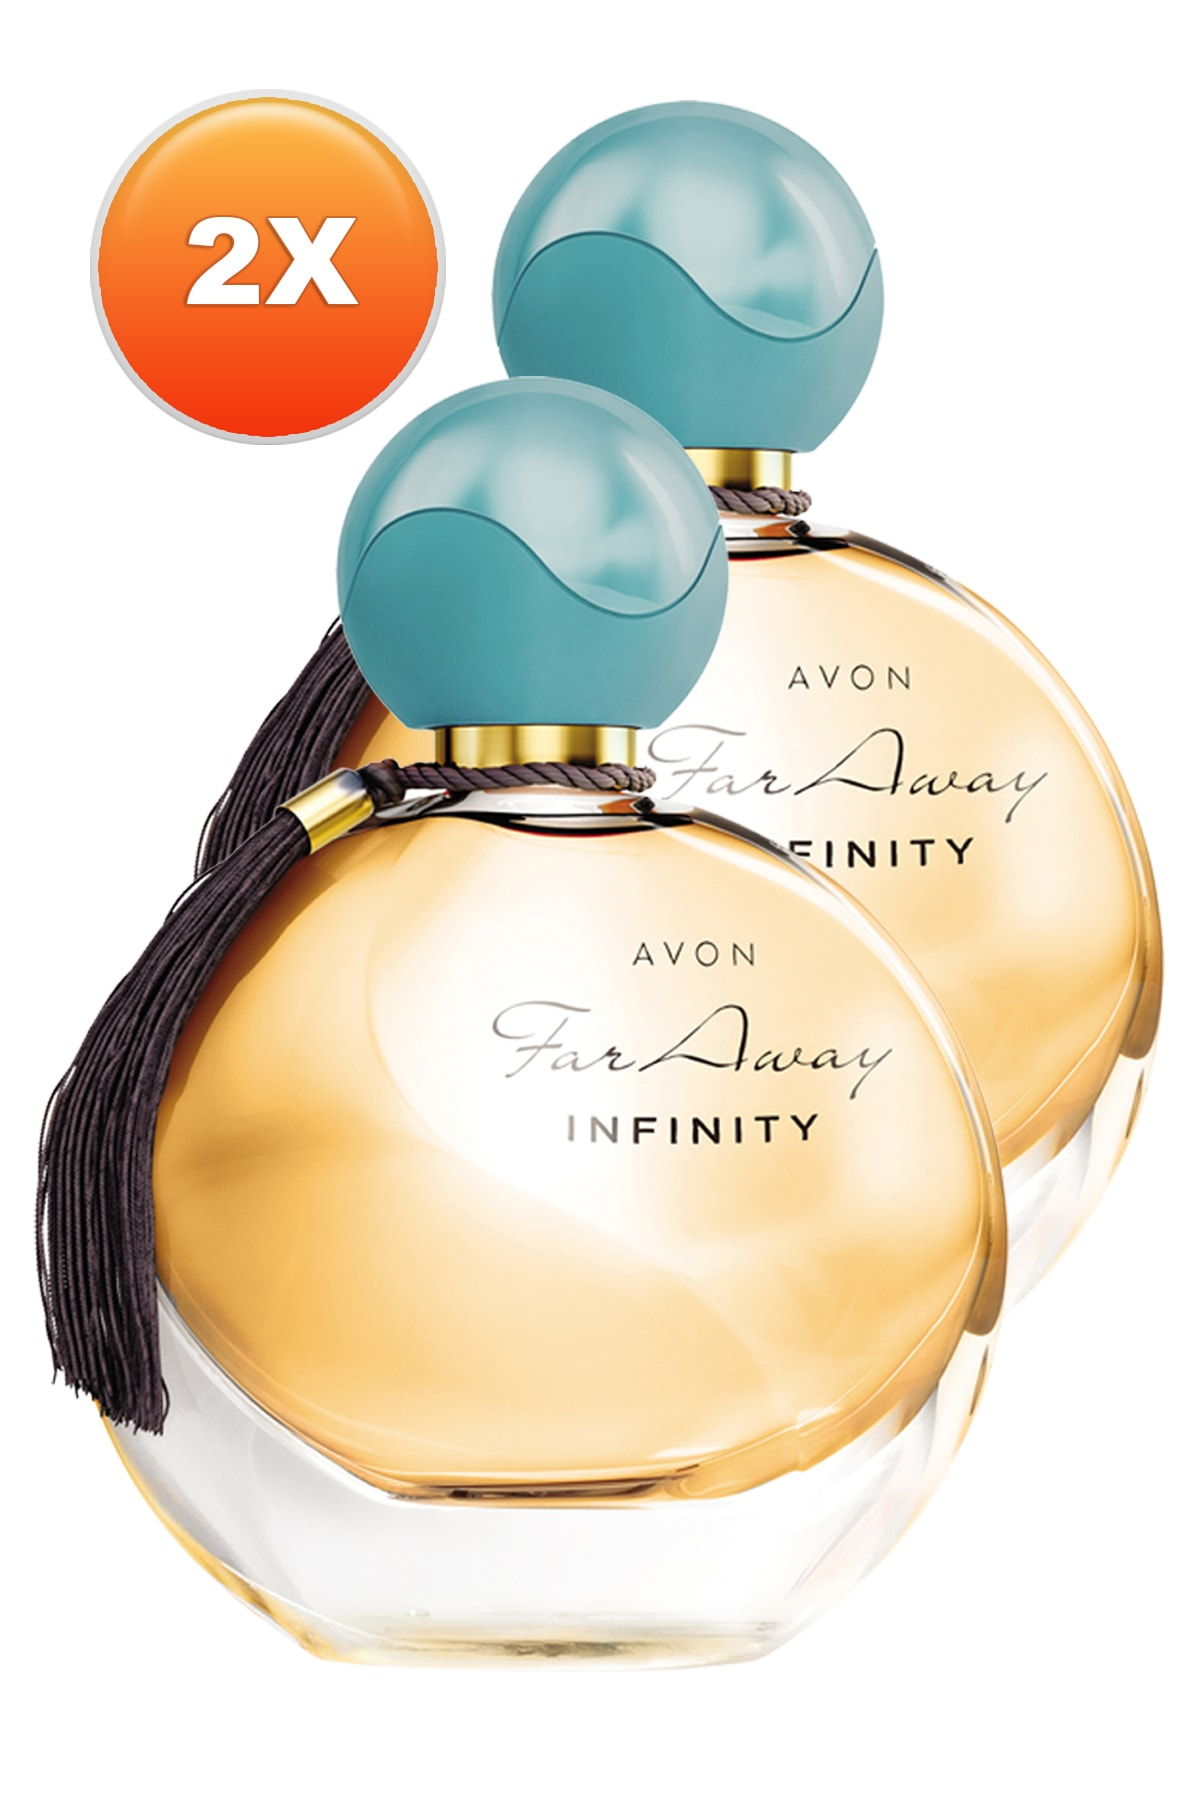 Avon Far Away Infinity Kadın Parfüm Edp 50 ml 2'li Set 5050000101974 1